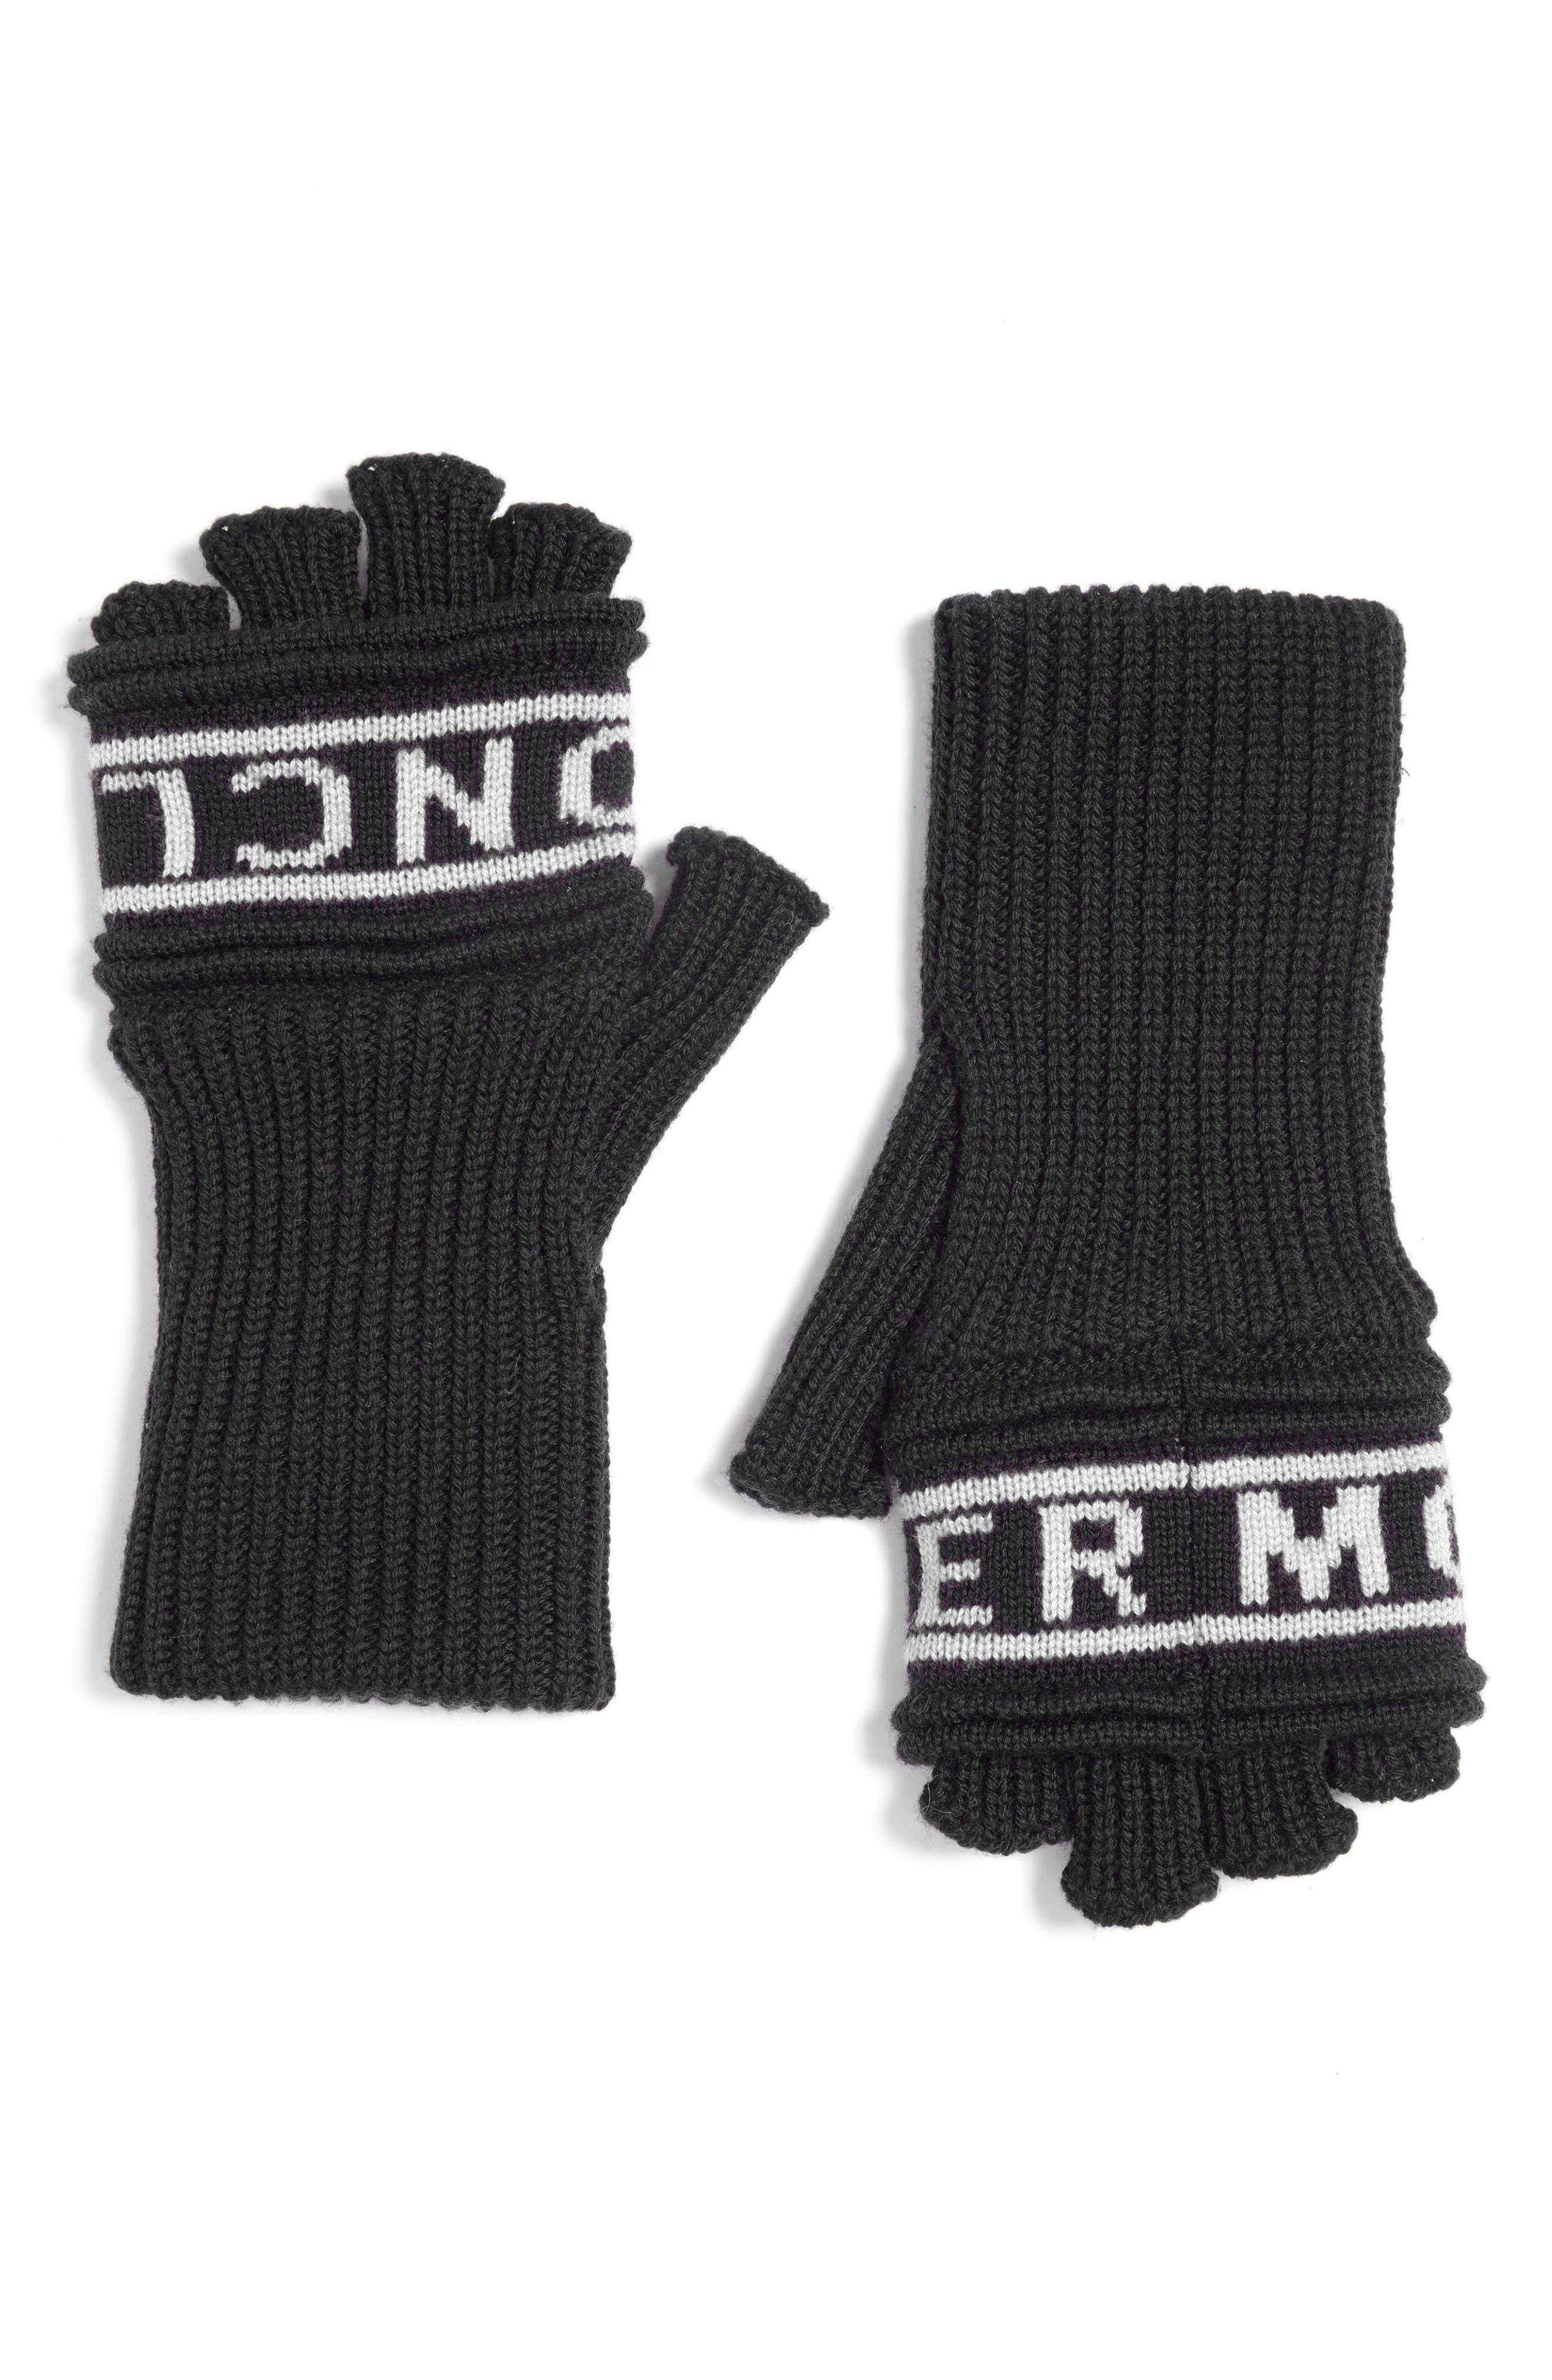 Guanti Wool Long Fingerless Gloves,                             Main thumbnail 1, color,                             Black